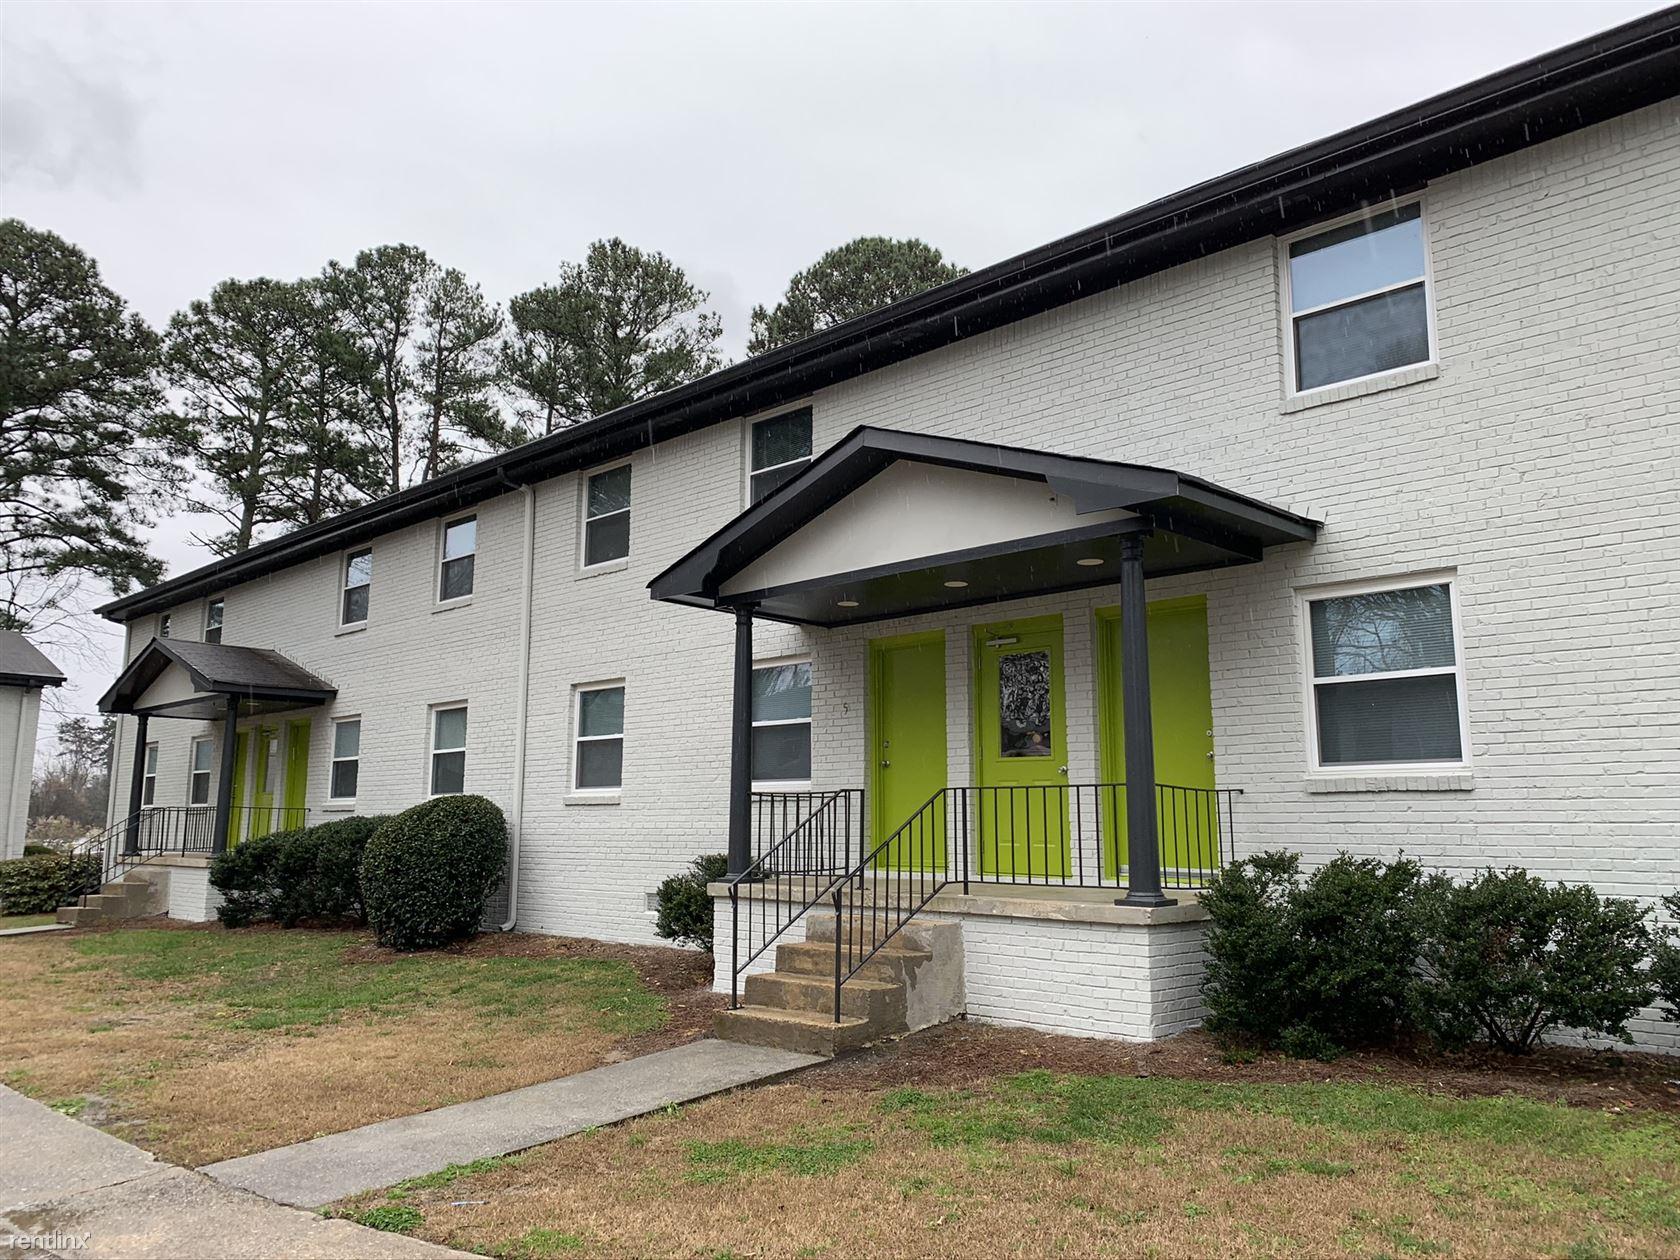 260 Main St, Forest Park, GA - $800